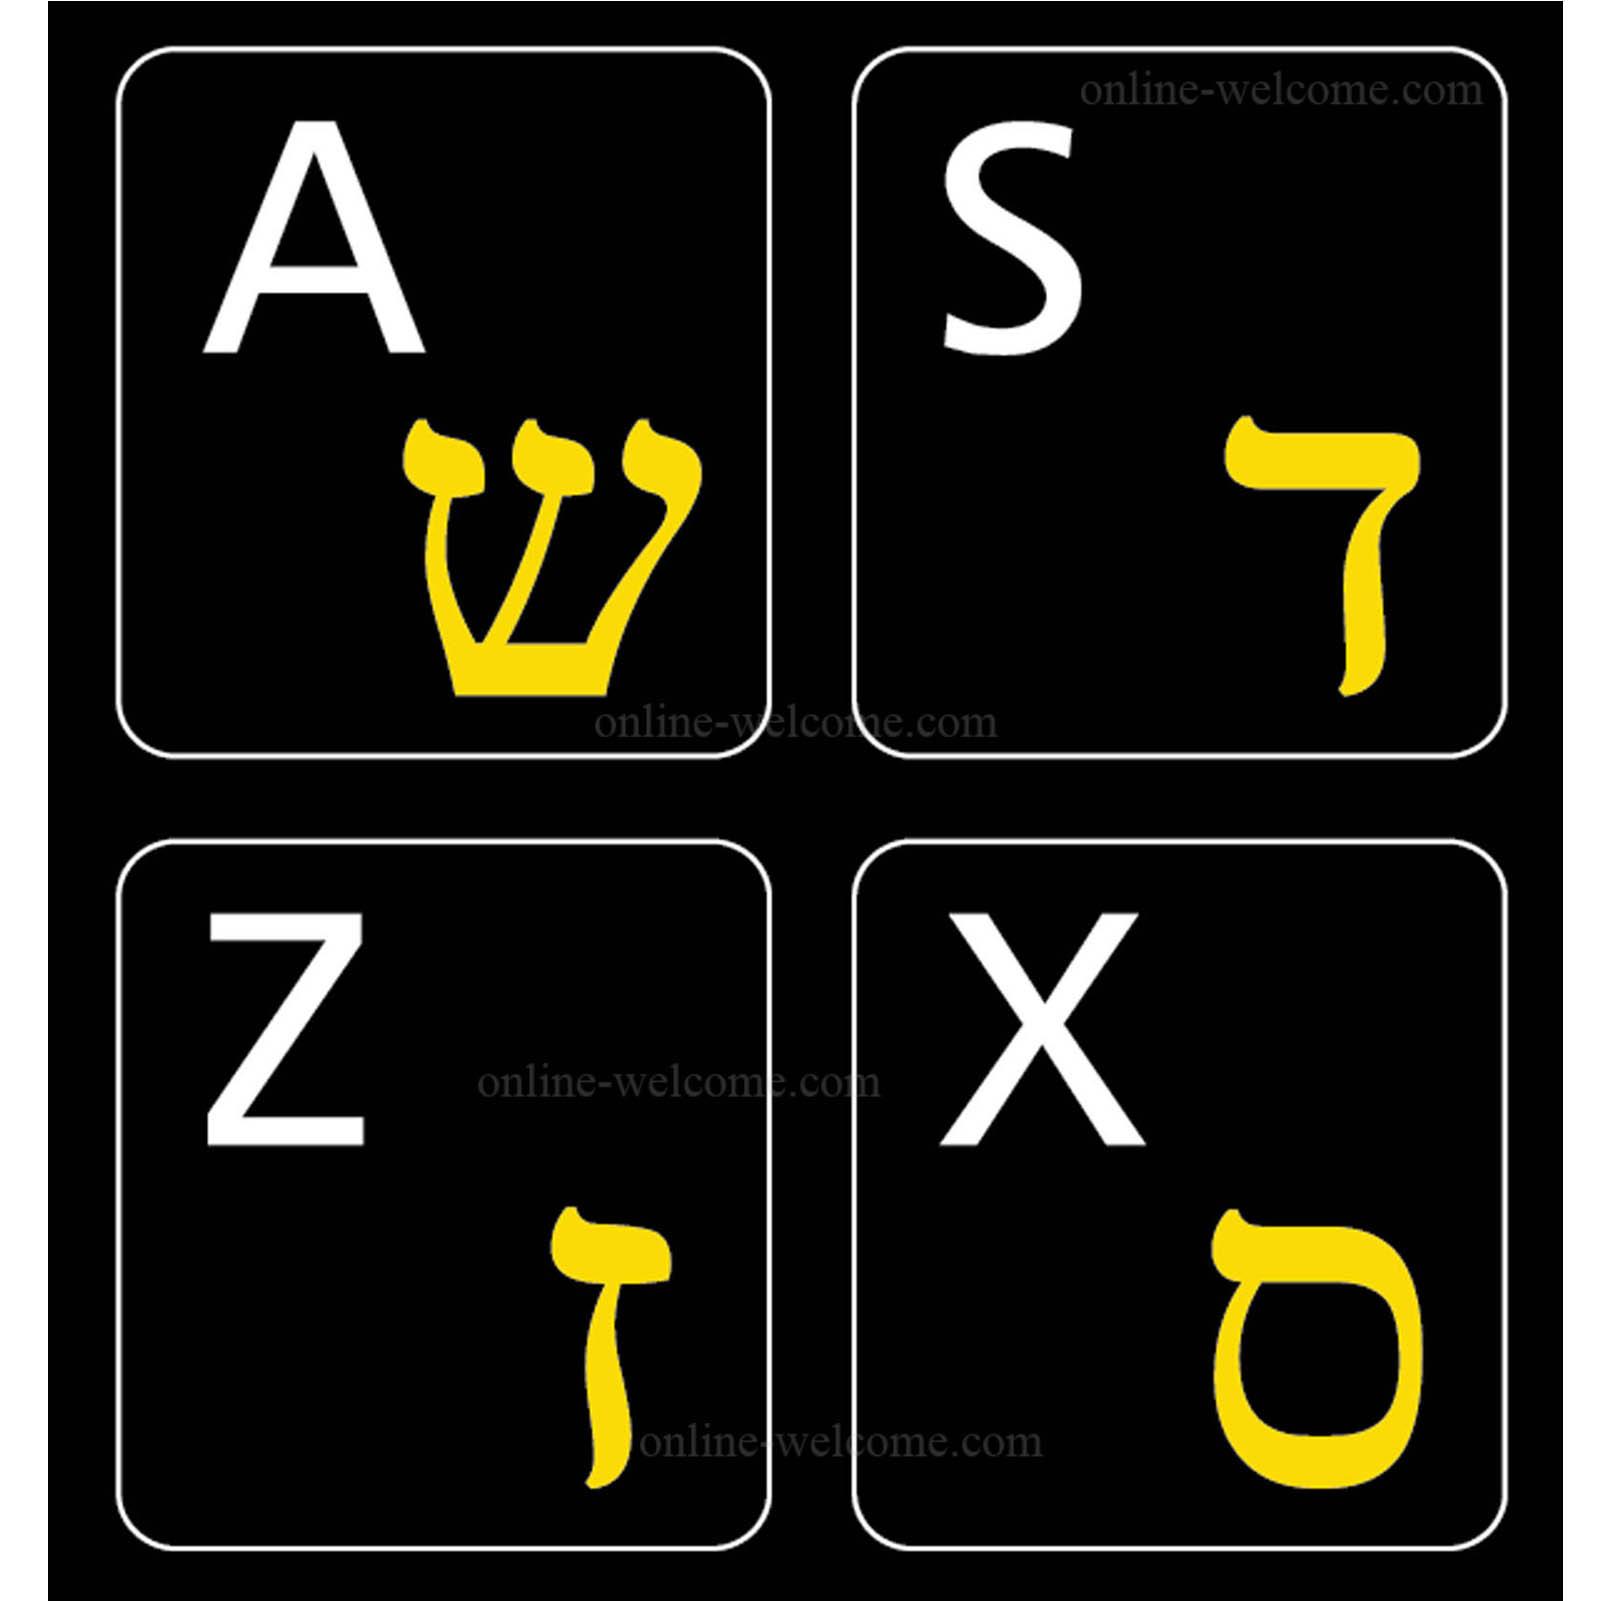 Hebrew-English non transparent keyboard sticker black